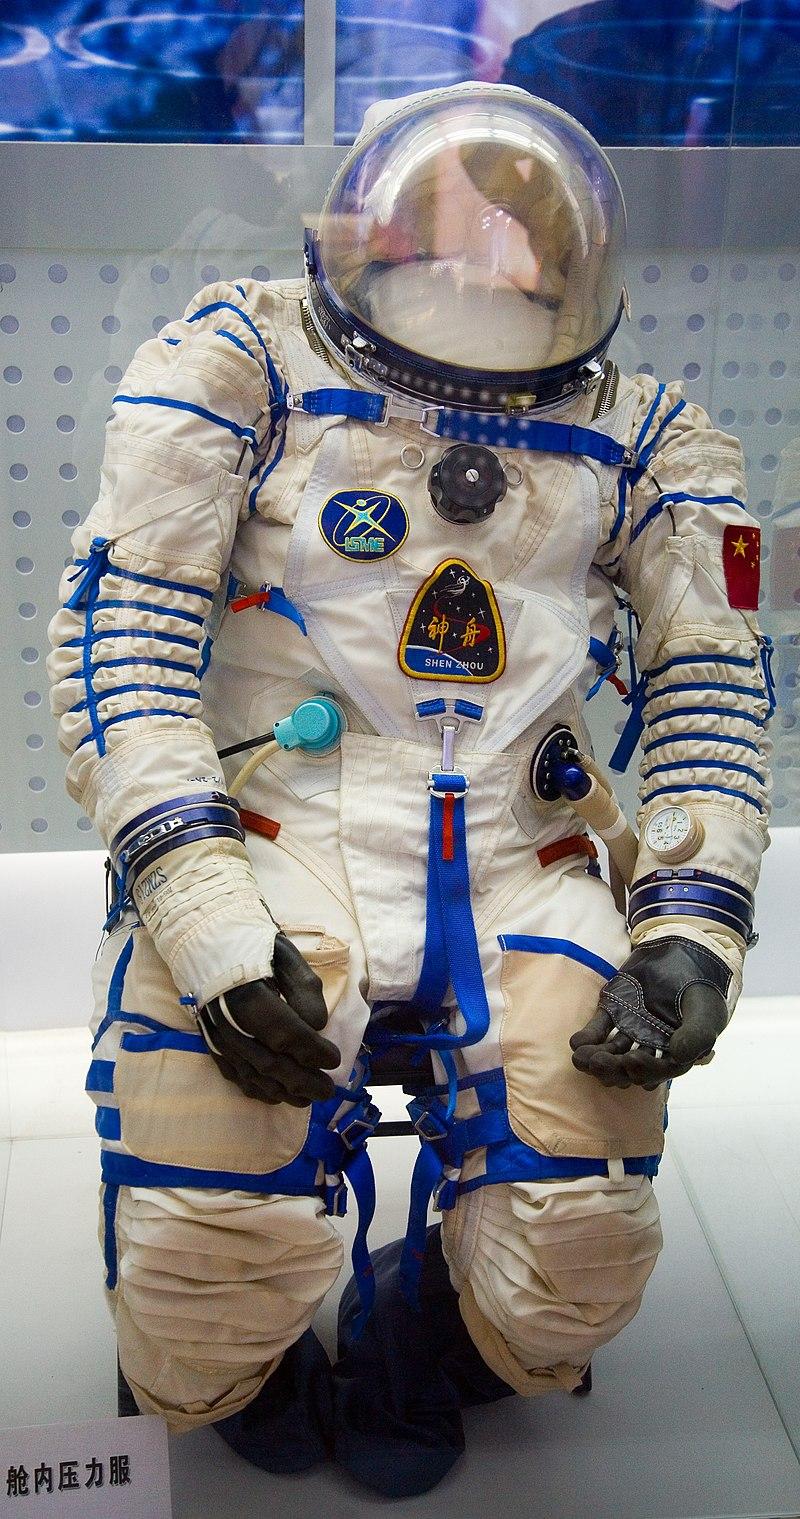 Shenzhou 5 - Chinese Spacesuit on Display.jpg